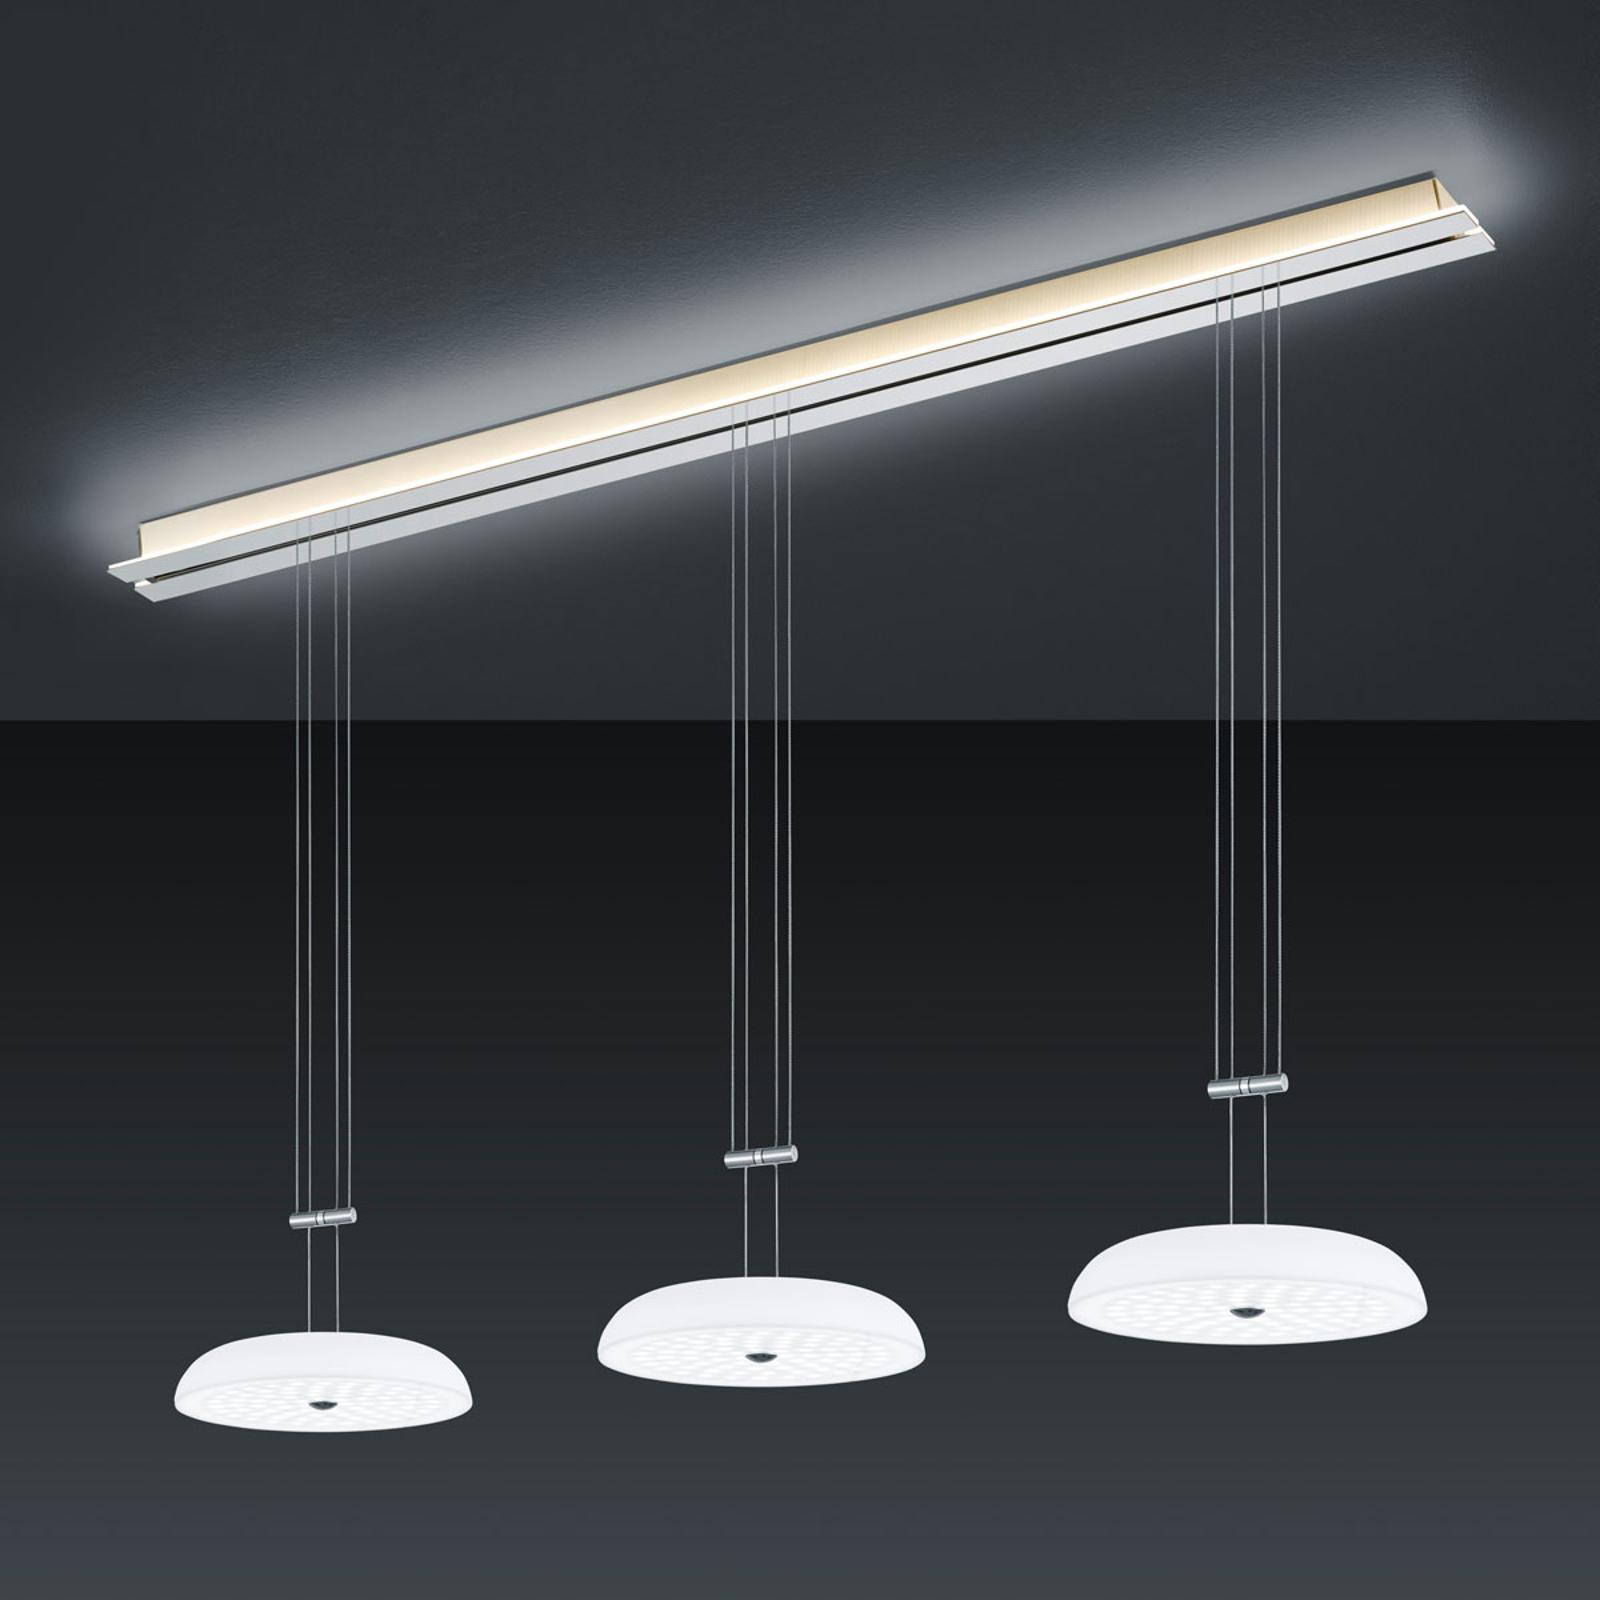 BANKAMP Strada Vanity hængelampe, 3 lysk., 155 cm